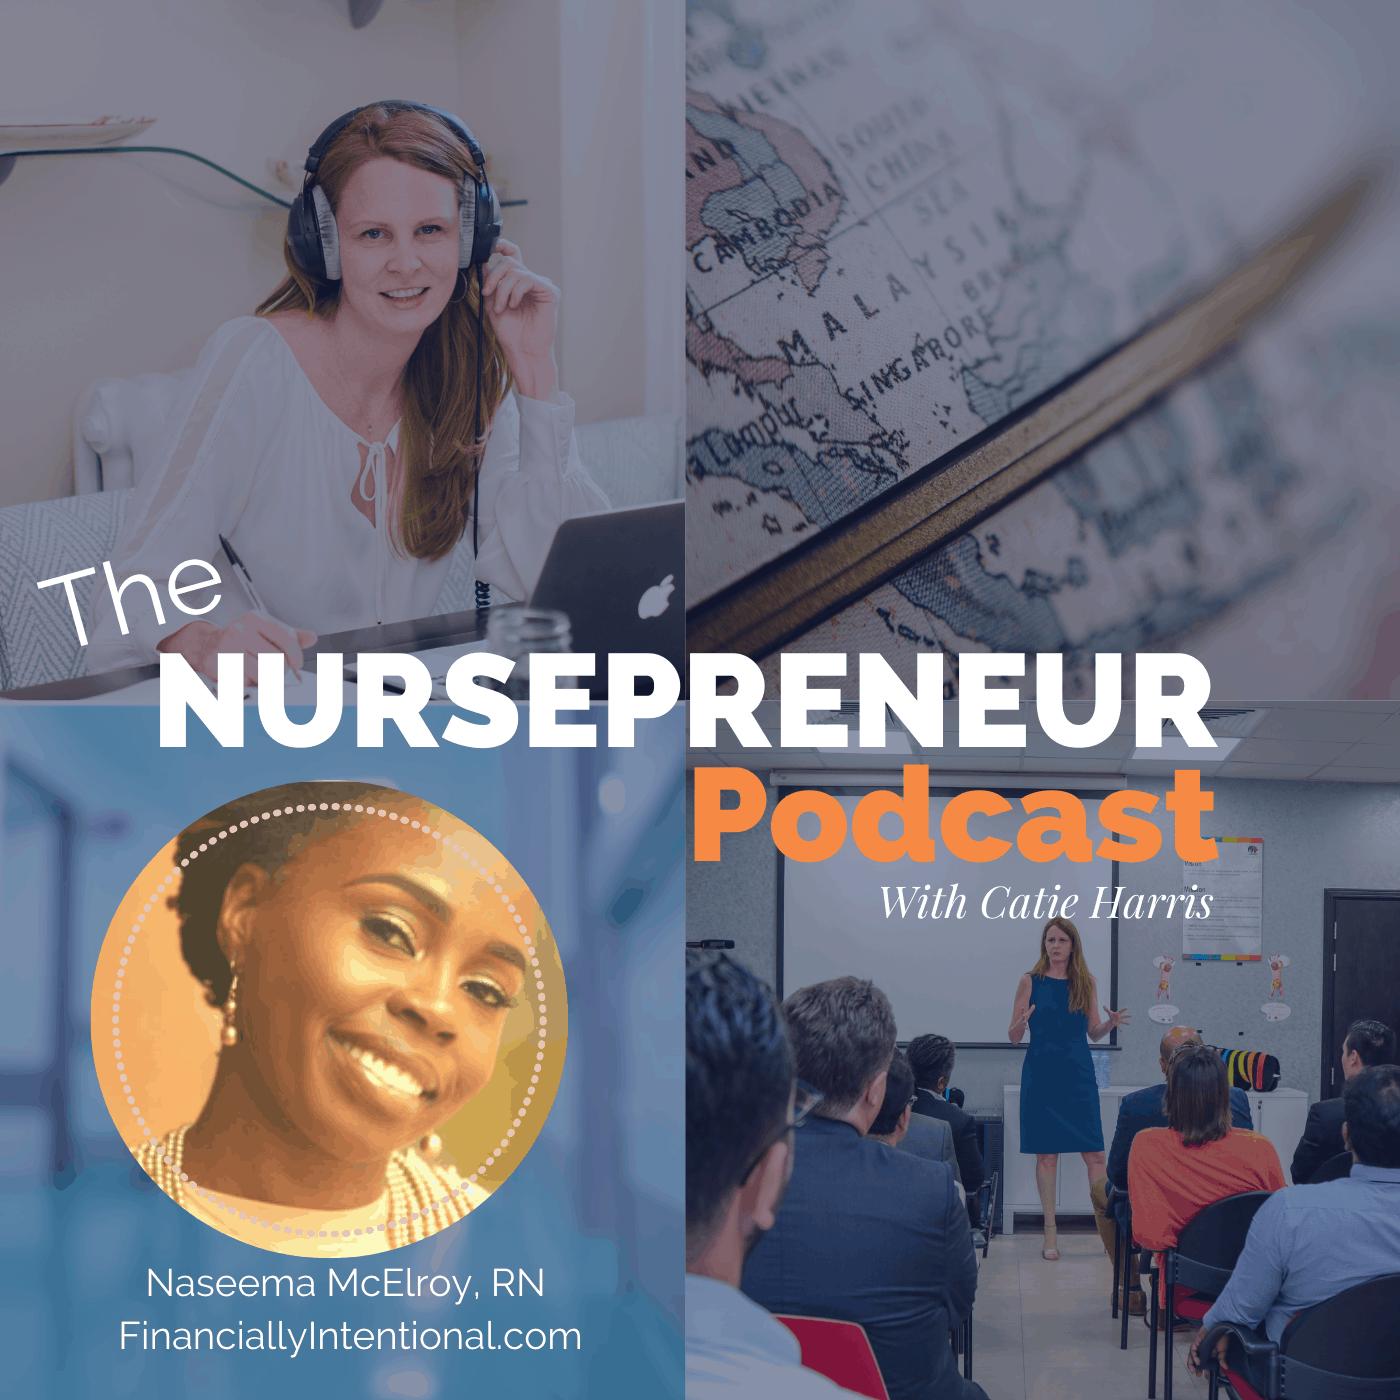 Financial Intentions NursePreneur Podcast